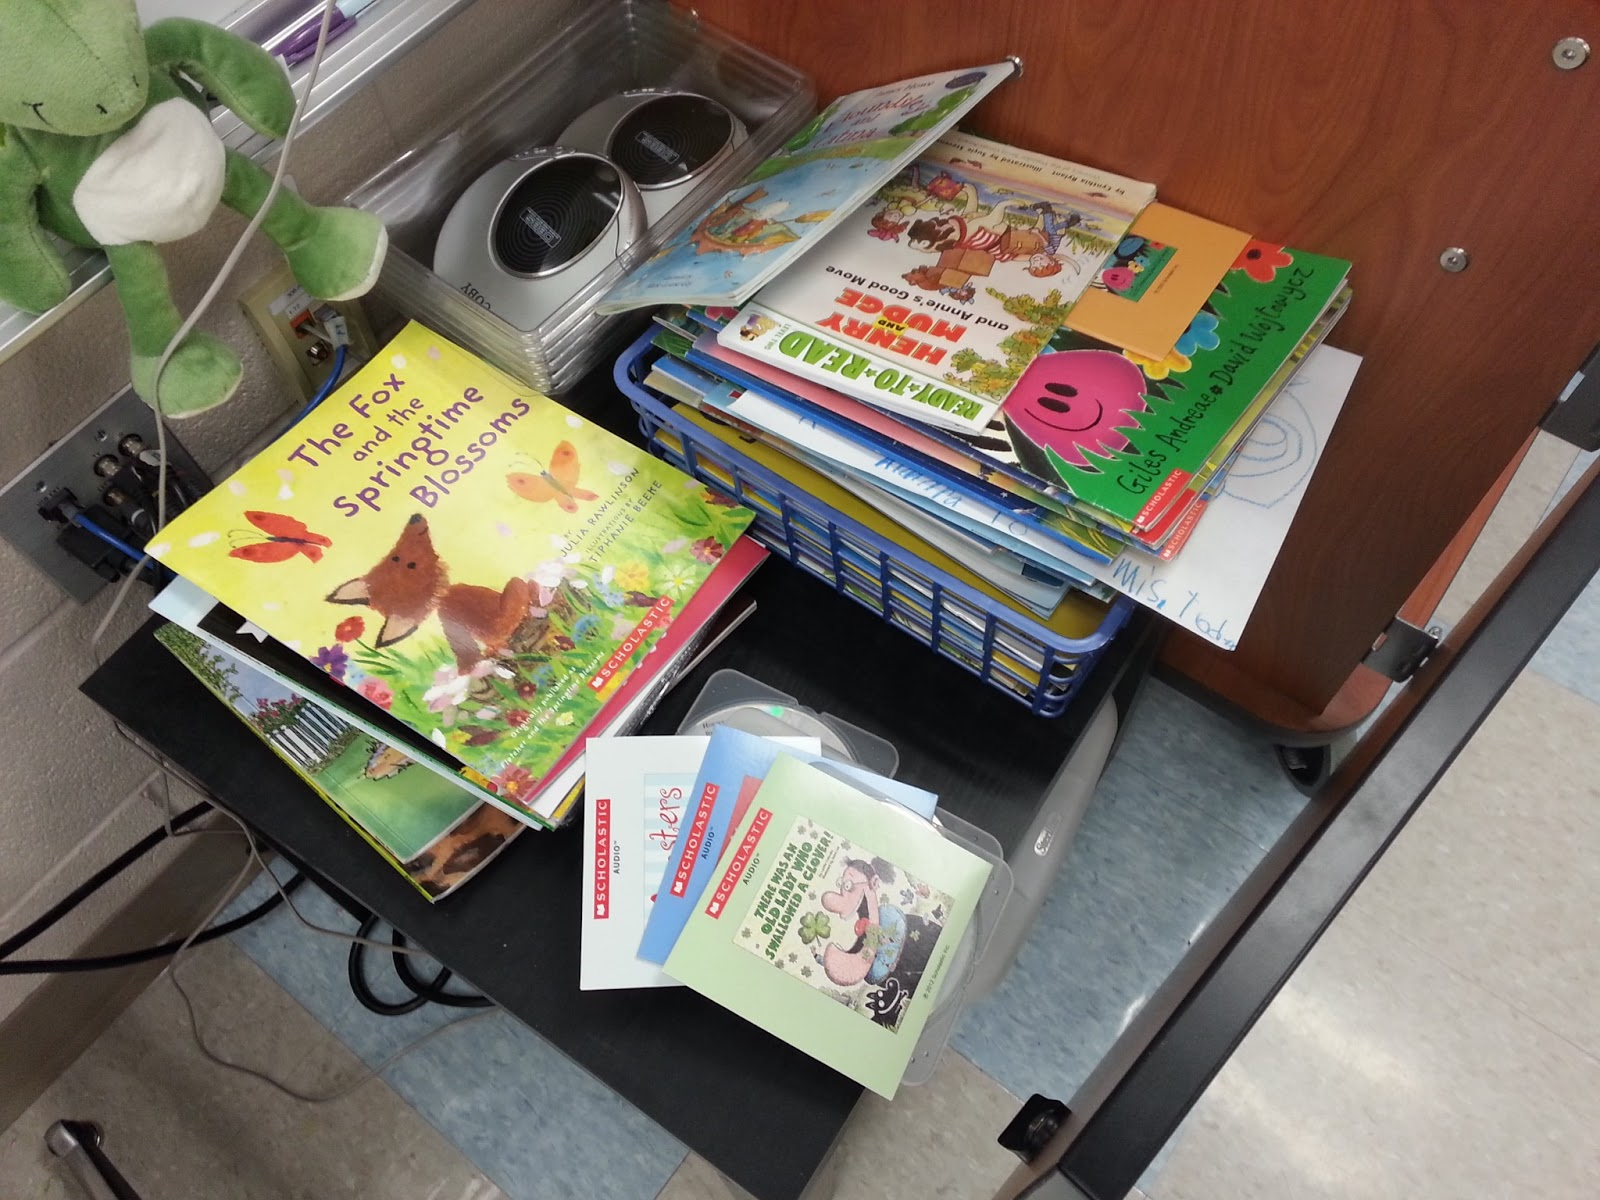 Books on CD Organization - photo#15